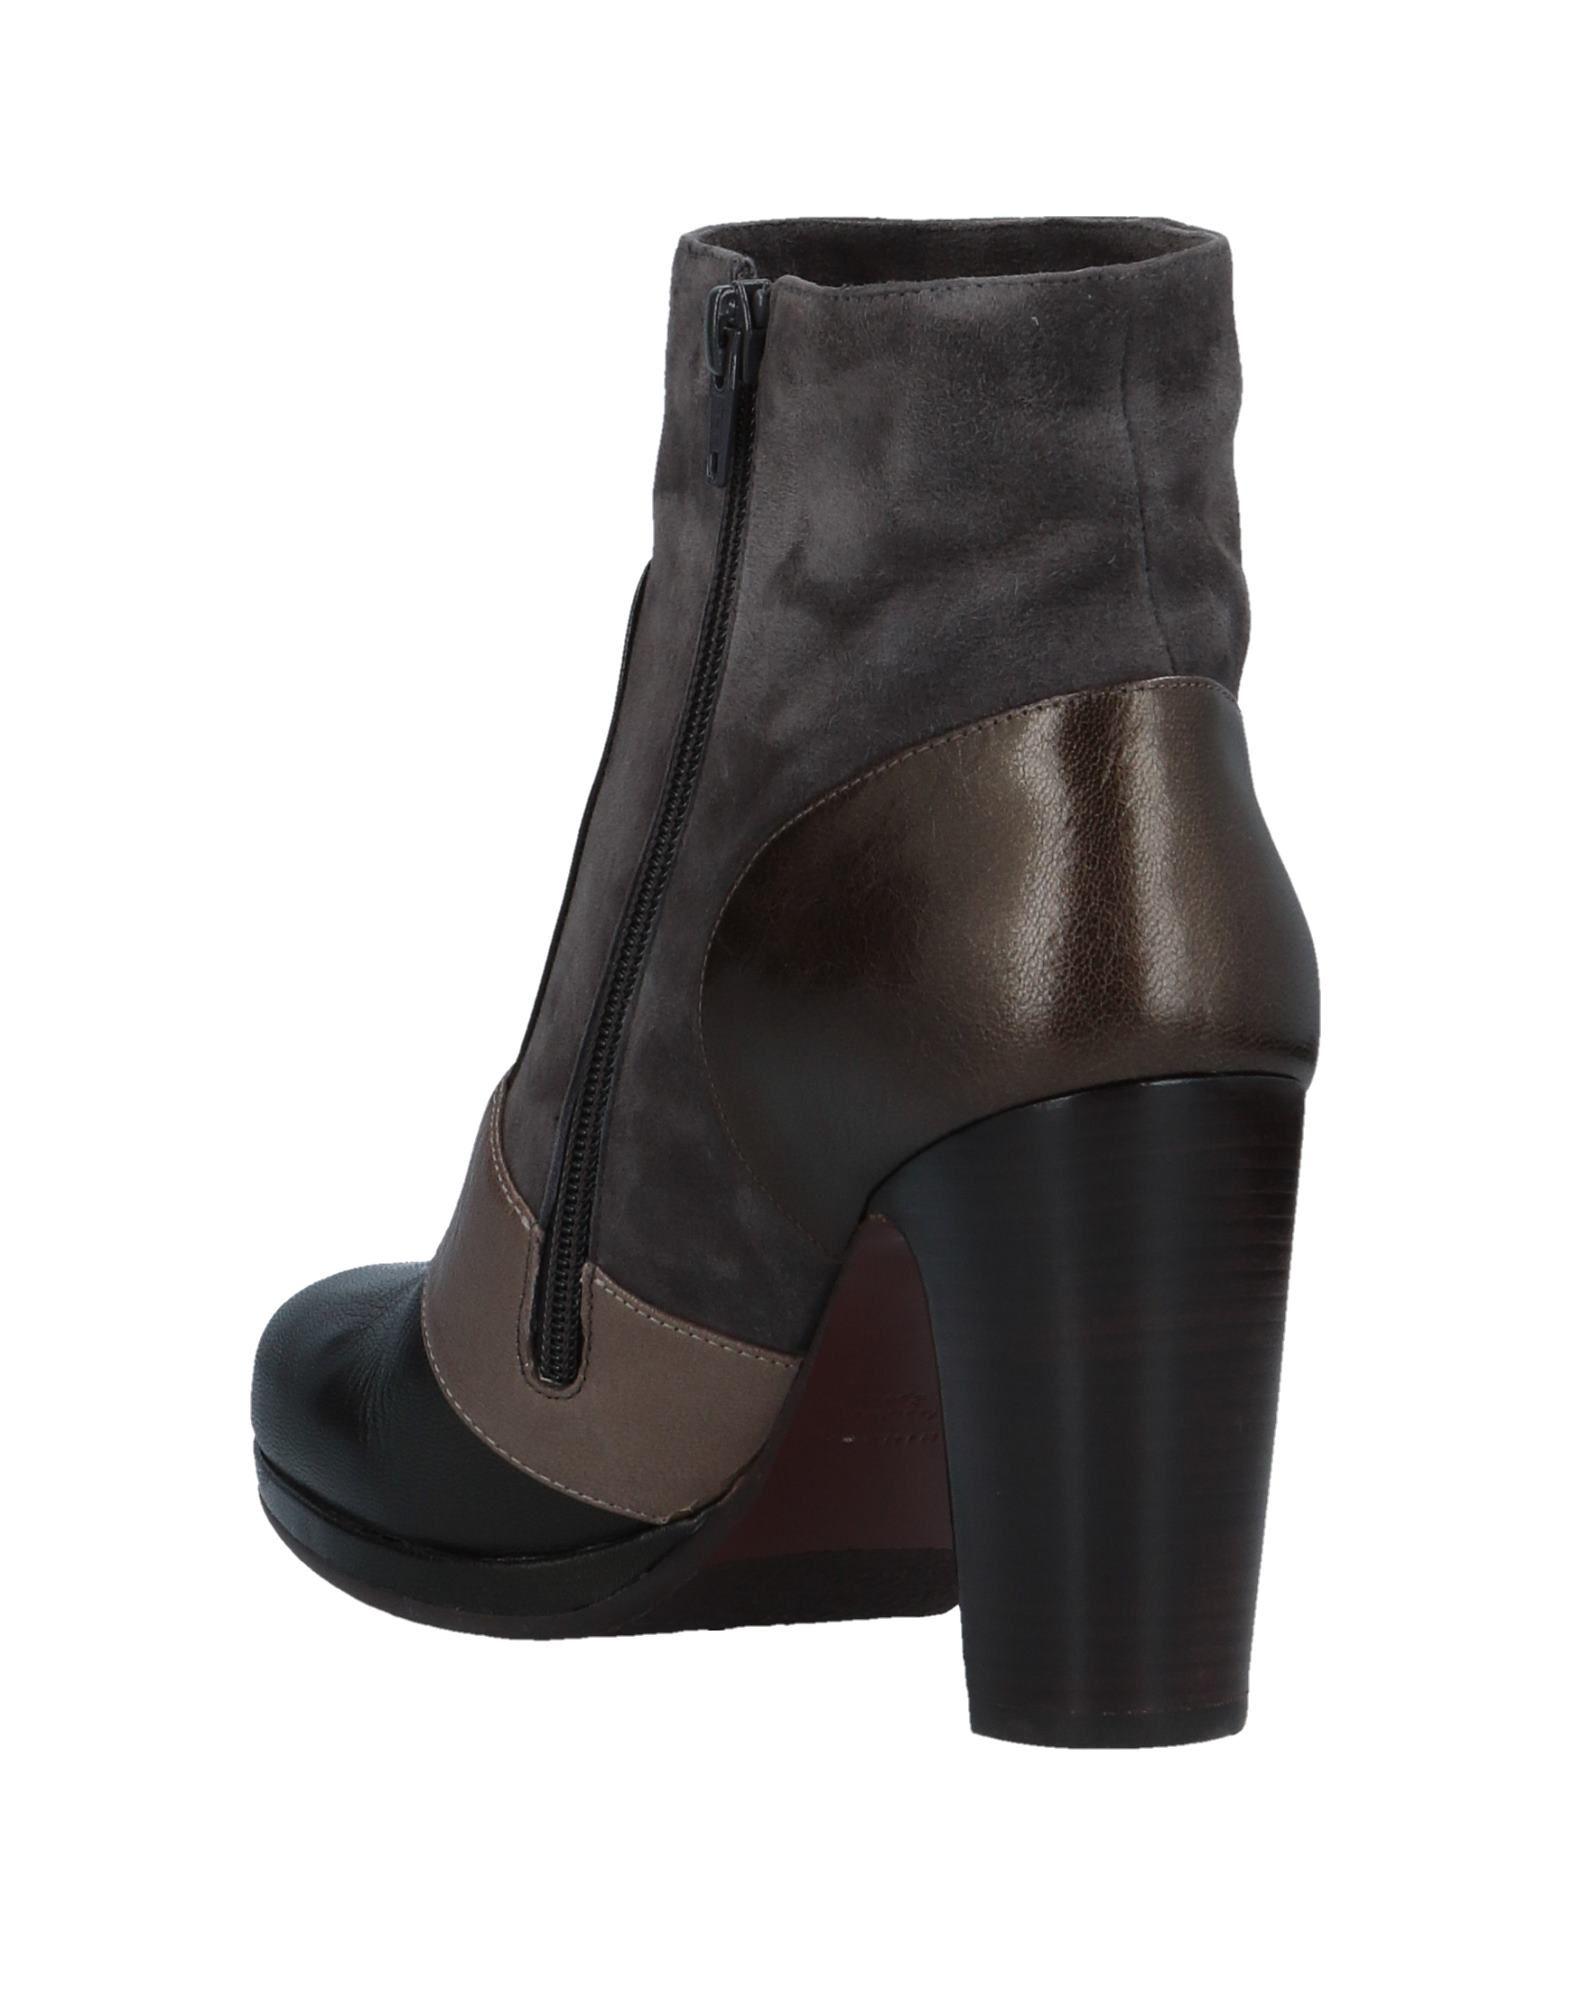 Chie Mihara Stiefelette Damen 11530019DWGut 11530019DWGut Damen aussehende strapazierfähige Schuhe 814e88